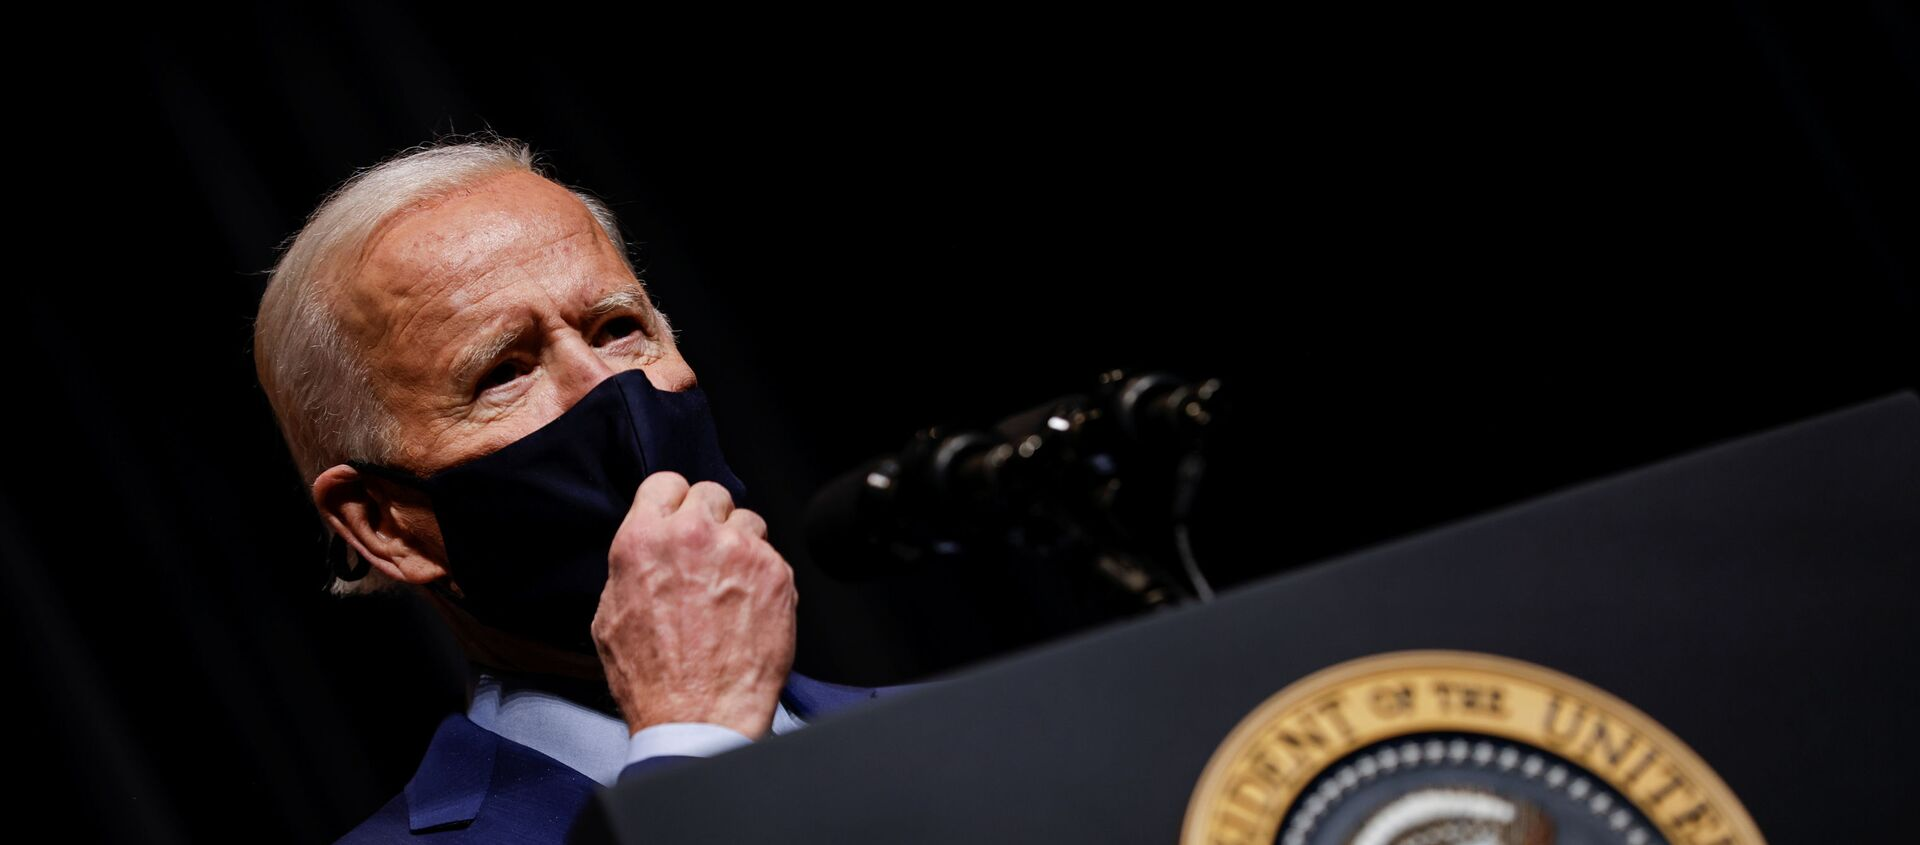 U.S. President Joe Biden removes his mask to address NIH staff during a visit to NIH in Bethesda, Maryland, U.S., February 11, 2021.  - Sputnik Italia, 1920, 06.03.2021